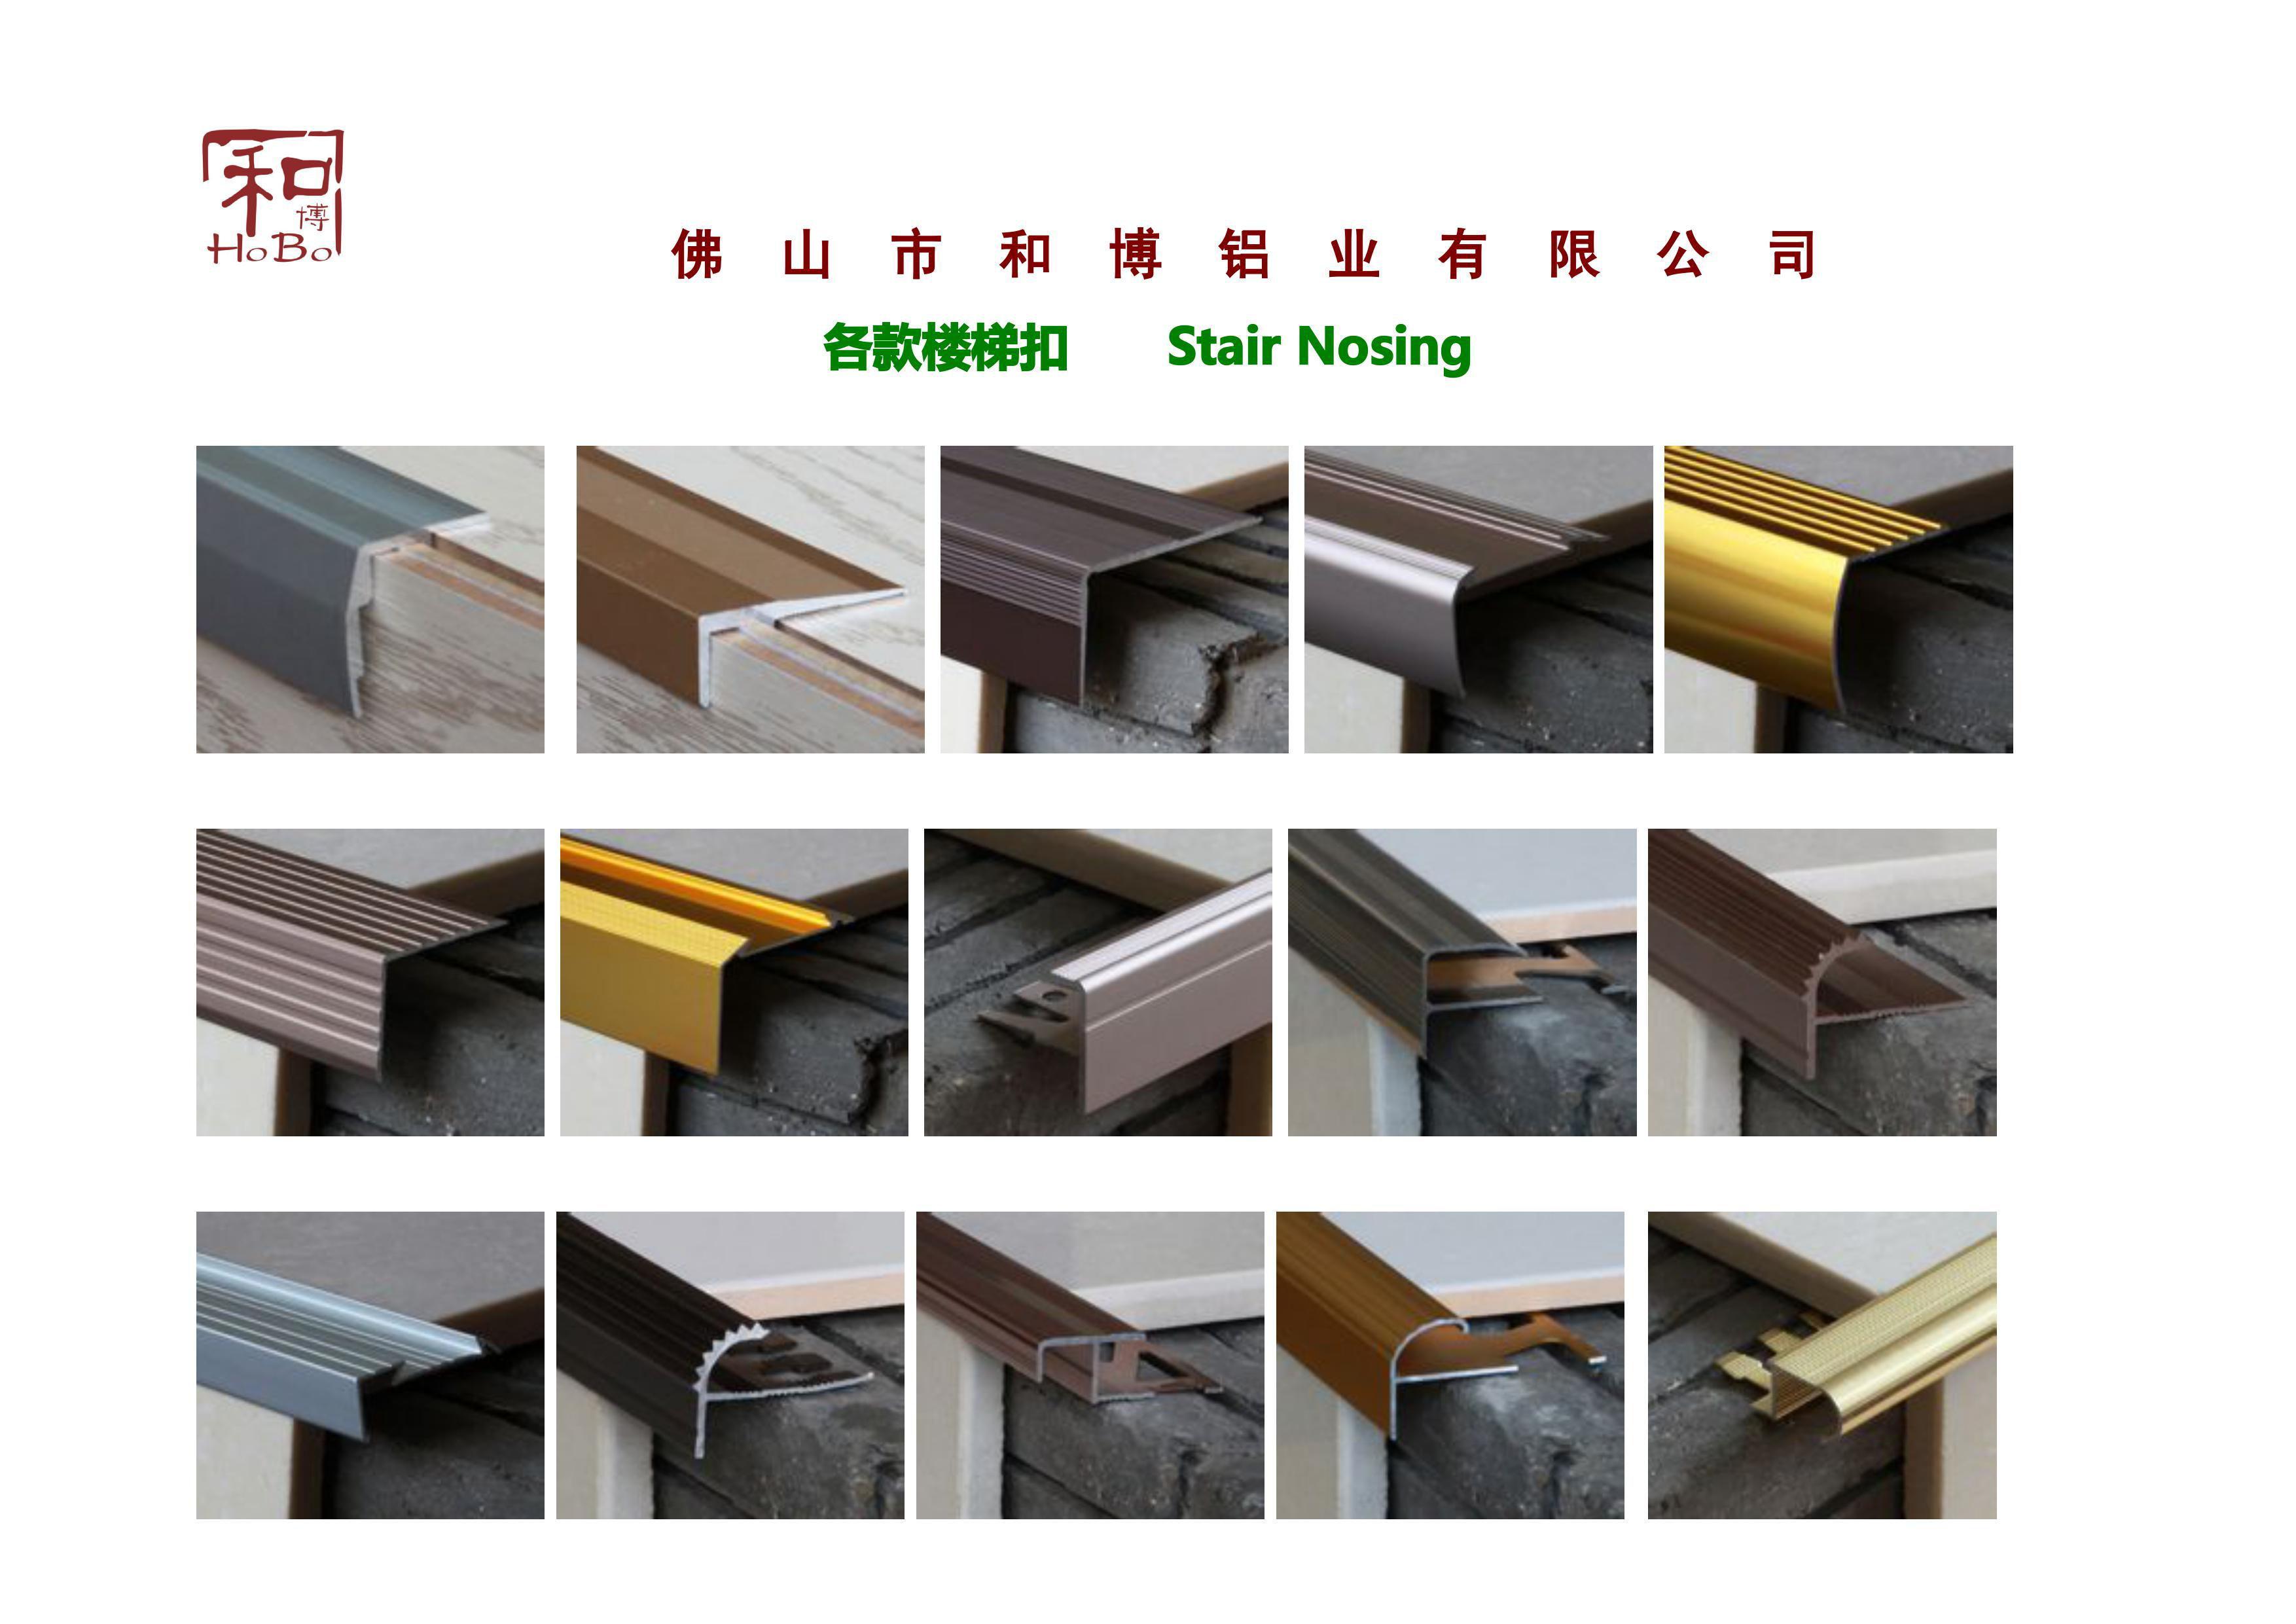 China ceramic trims tile trims t molding edge profile bright china ceramic trims tile trims t molding edge profile bright silver china aluminum stair nosing dailygadgetfo Choice Image